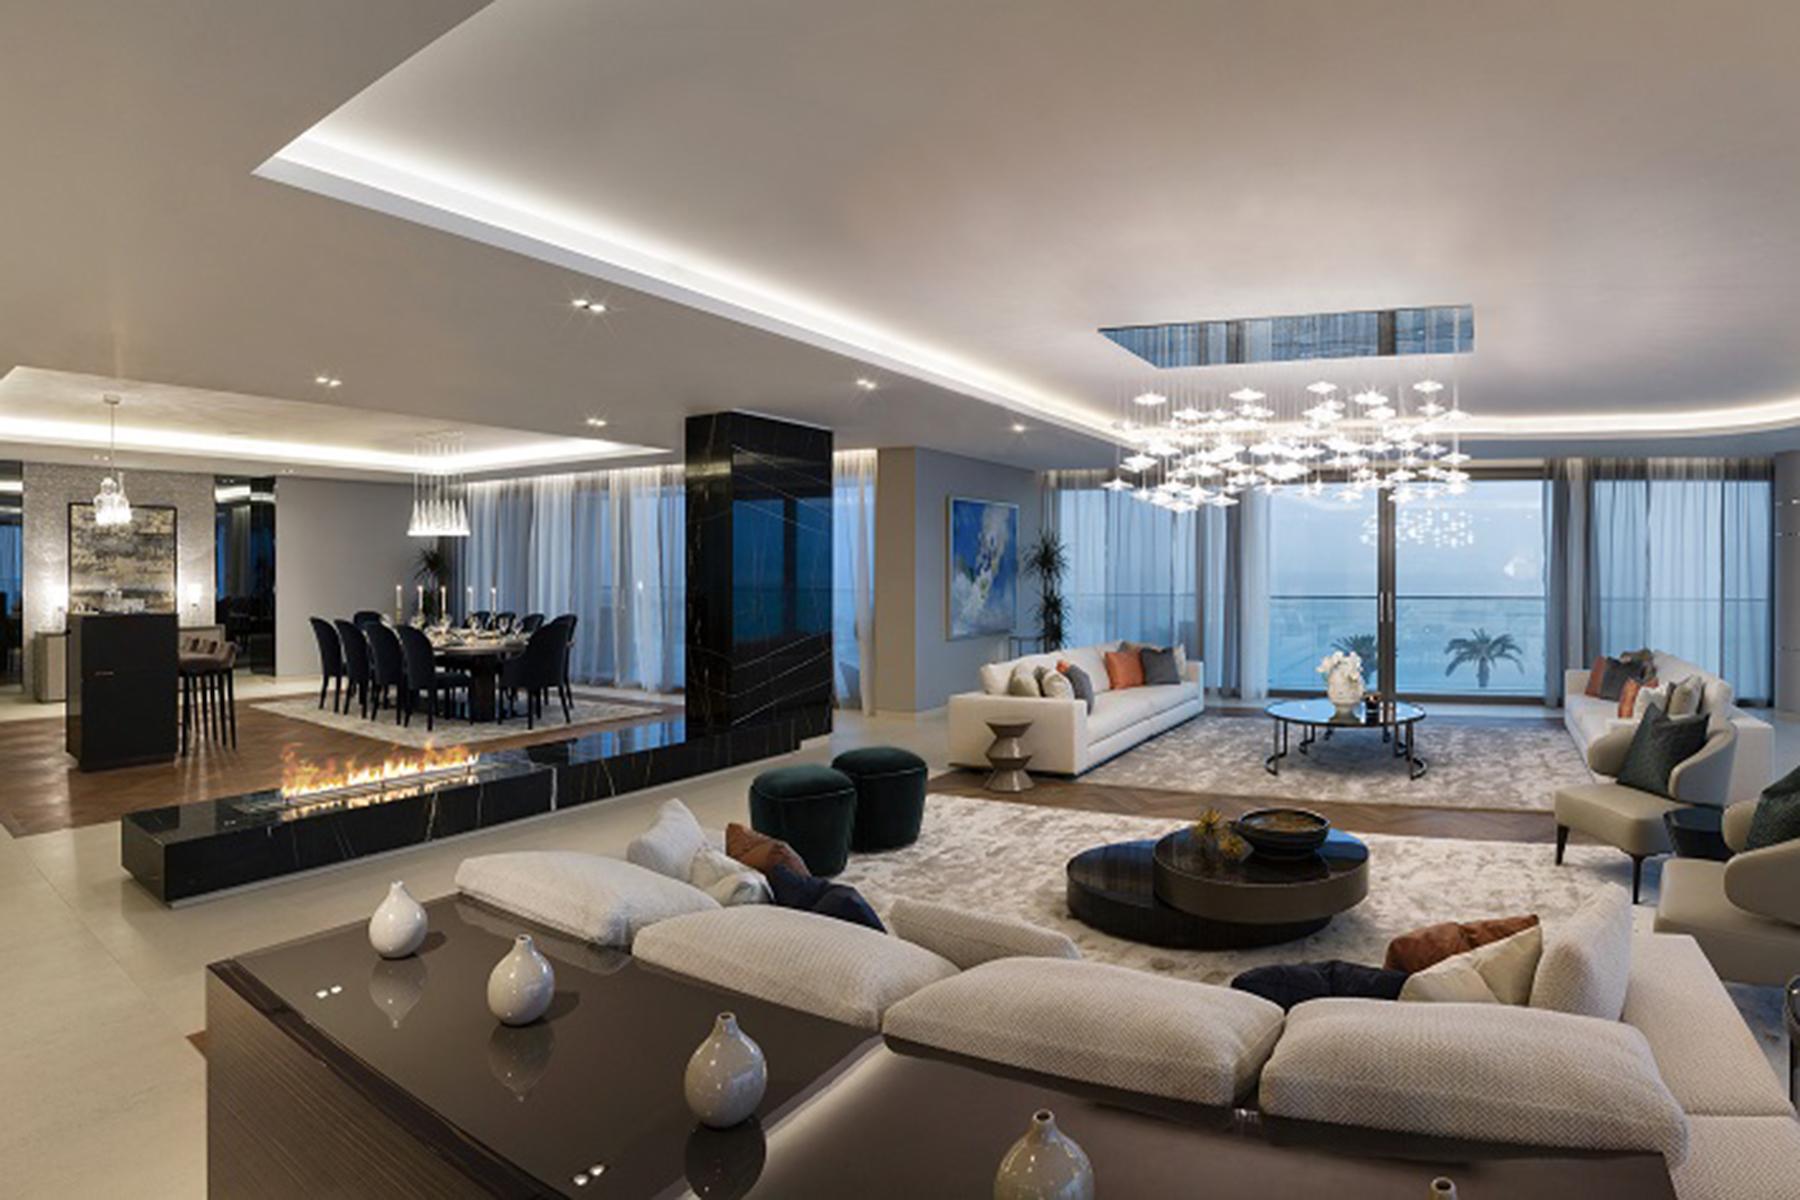 Property for Sale at Alef Residence Top Floor Penthouse, The Palm Palm Jumeirah Alef Residences Dubai, Dubai 00000 United Arab Emirates